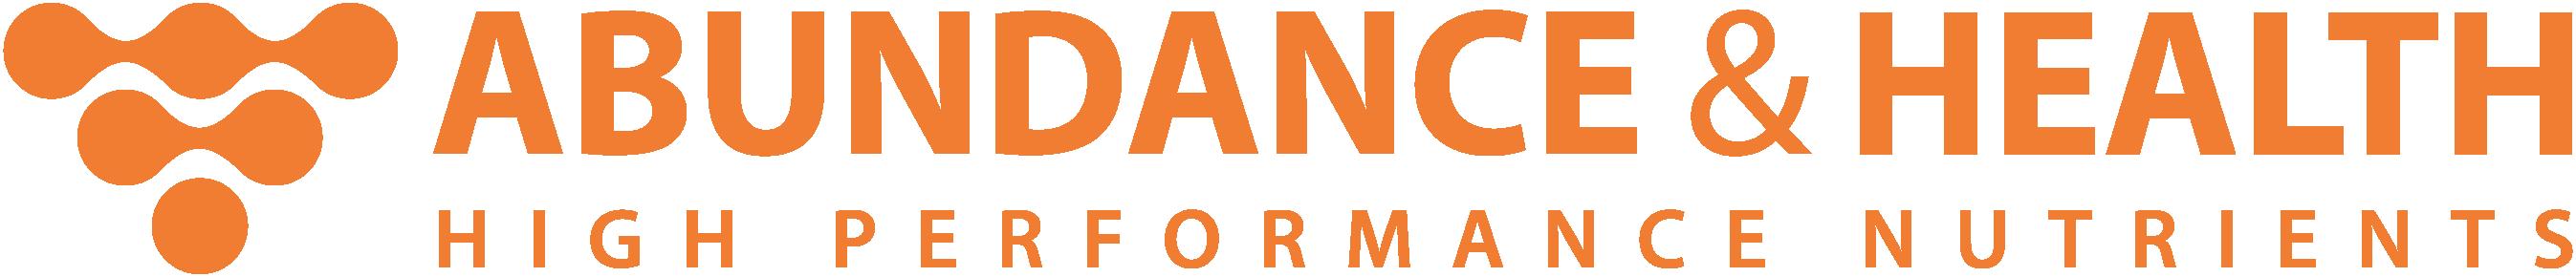 Abundance and Health